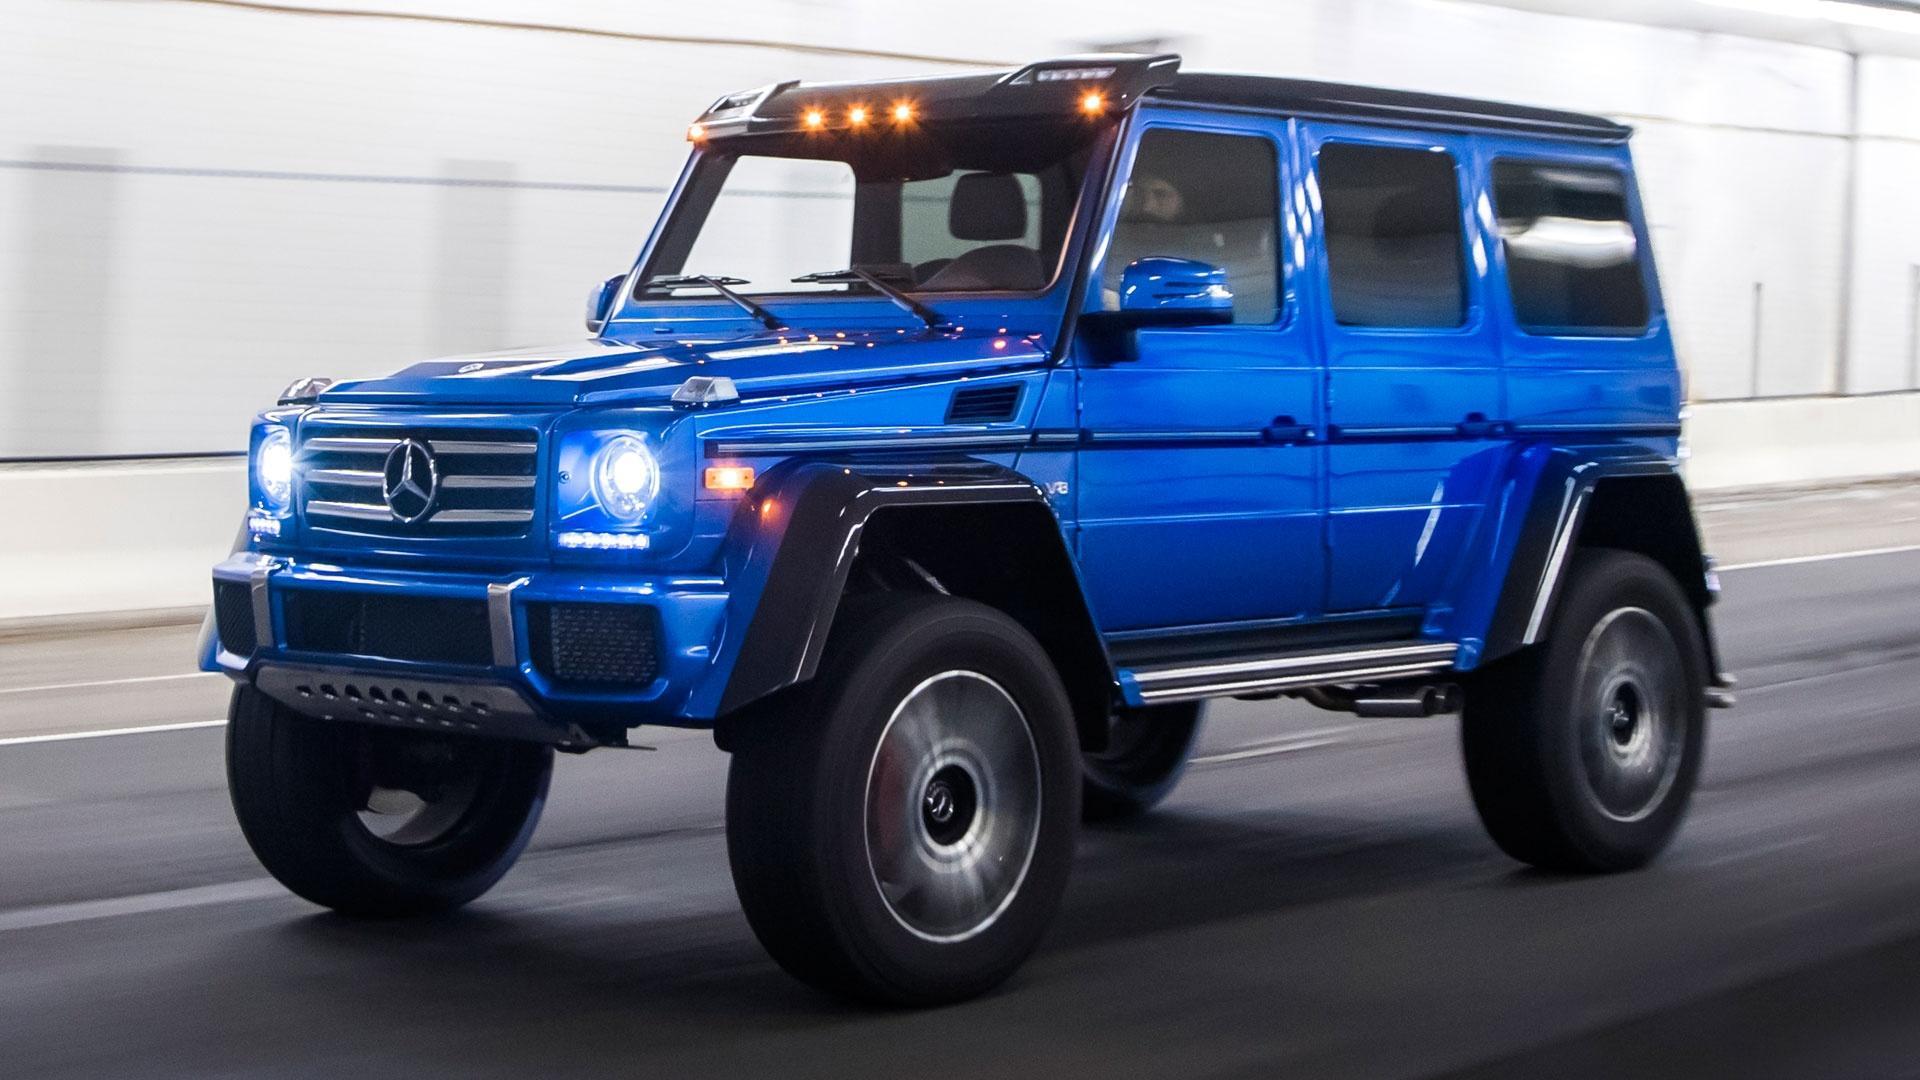 S37 e15 2017 mercedes benz g550 4x4 squared 2017 for Mercedes benz g550 4x4